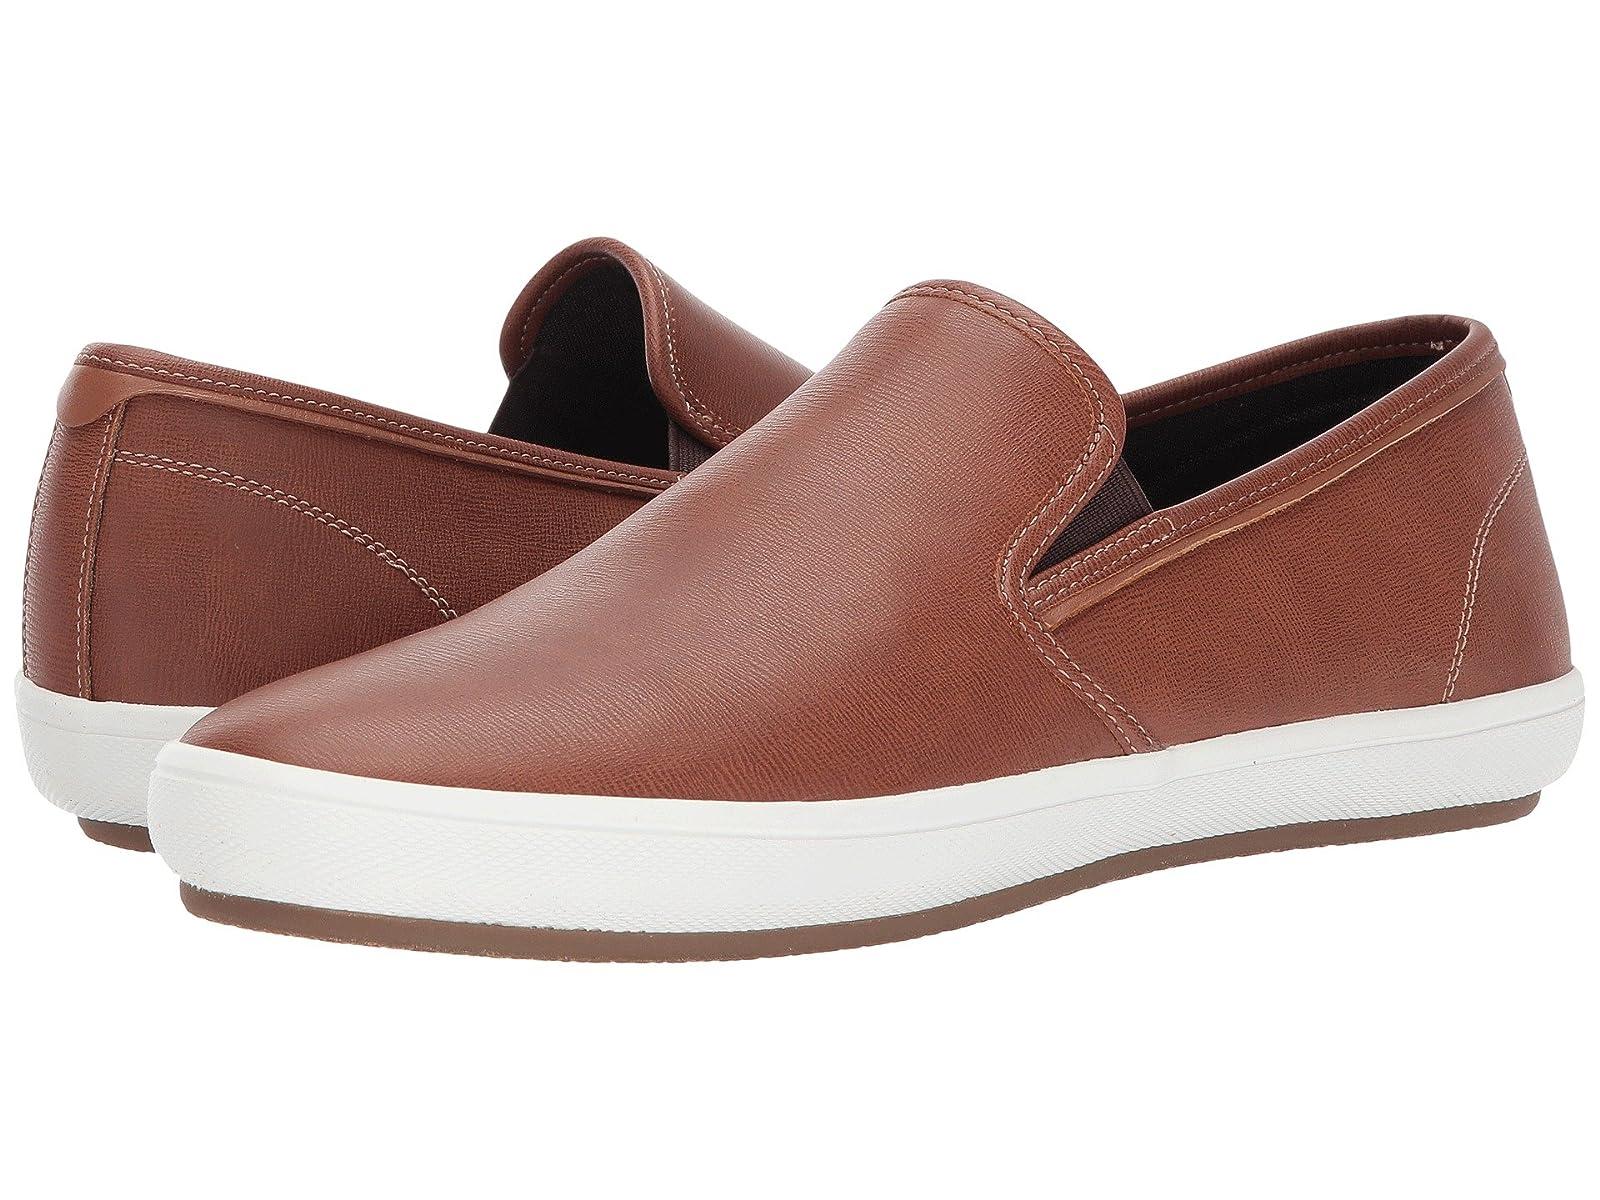 ALDO Haelasien-RCheap and distinctive eye-catching shoes